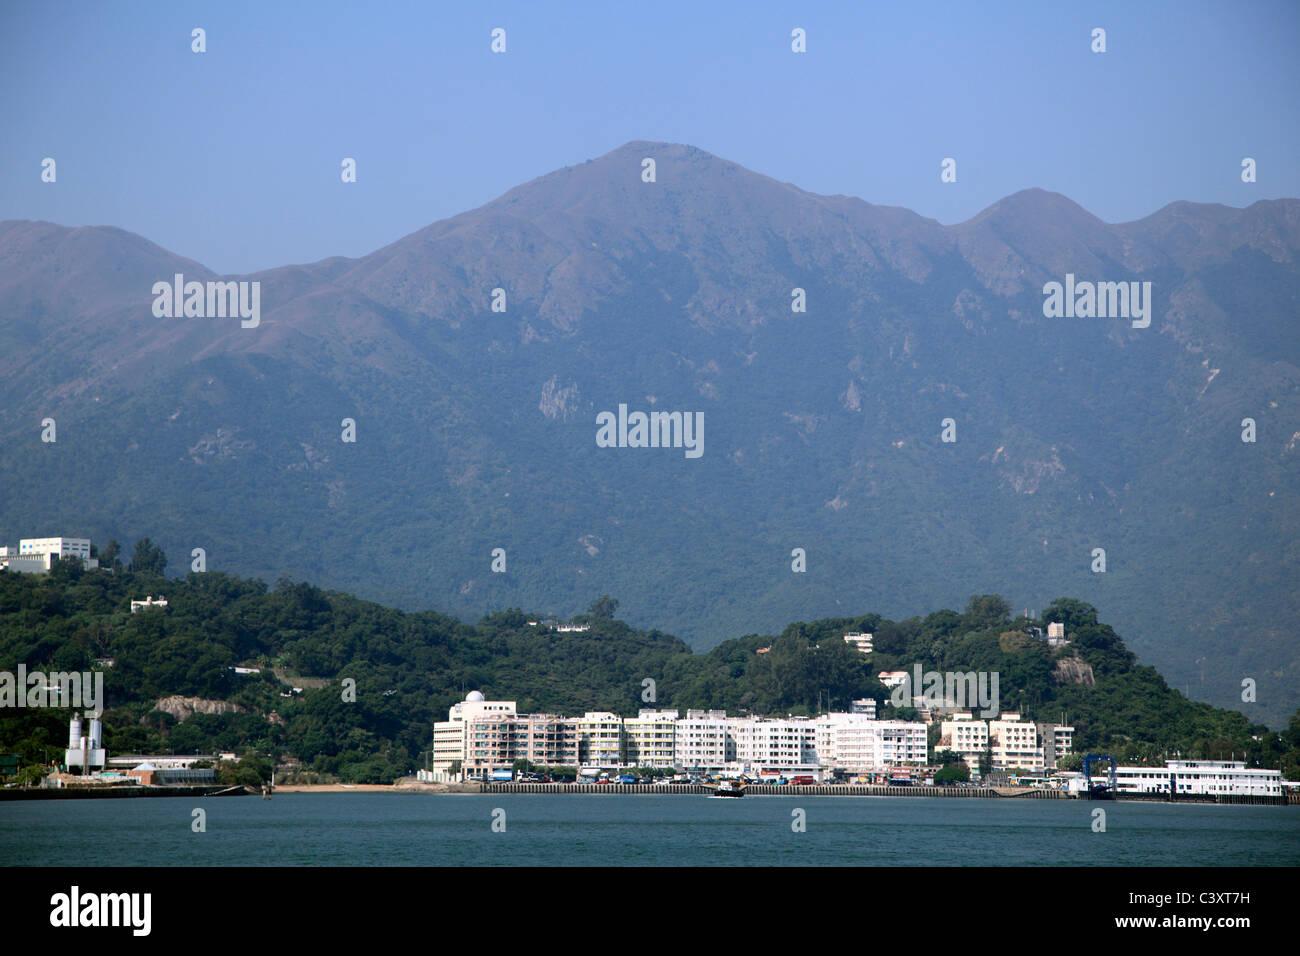 Launtau Island, Mui Wo Village, Hong Kong, China, Asia - Stock Image